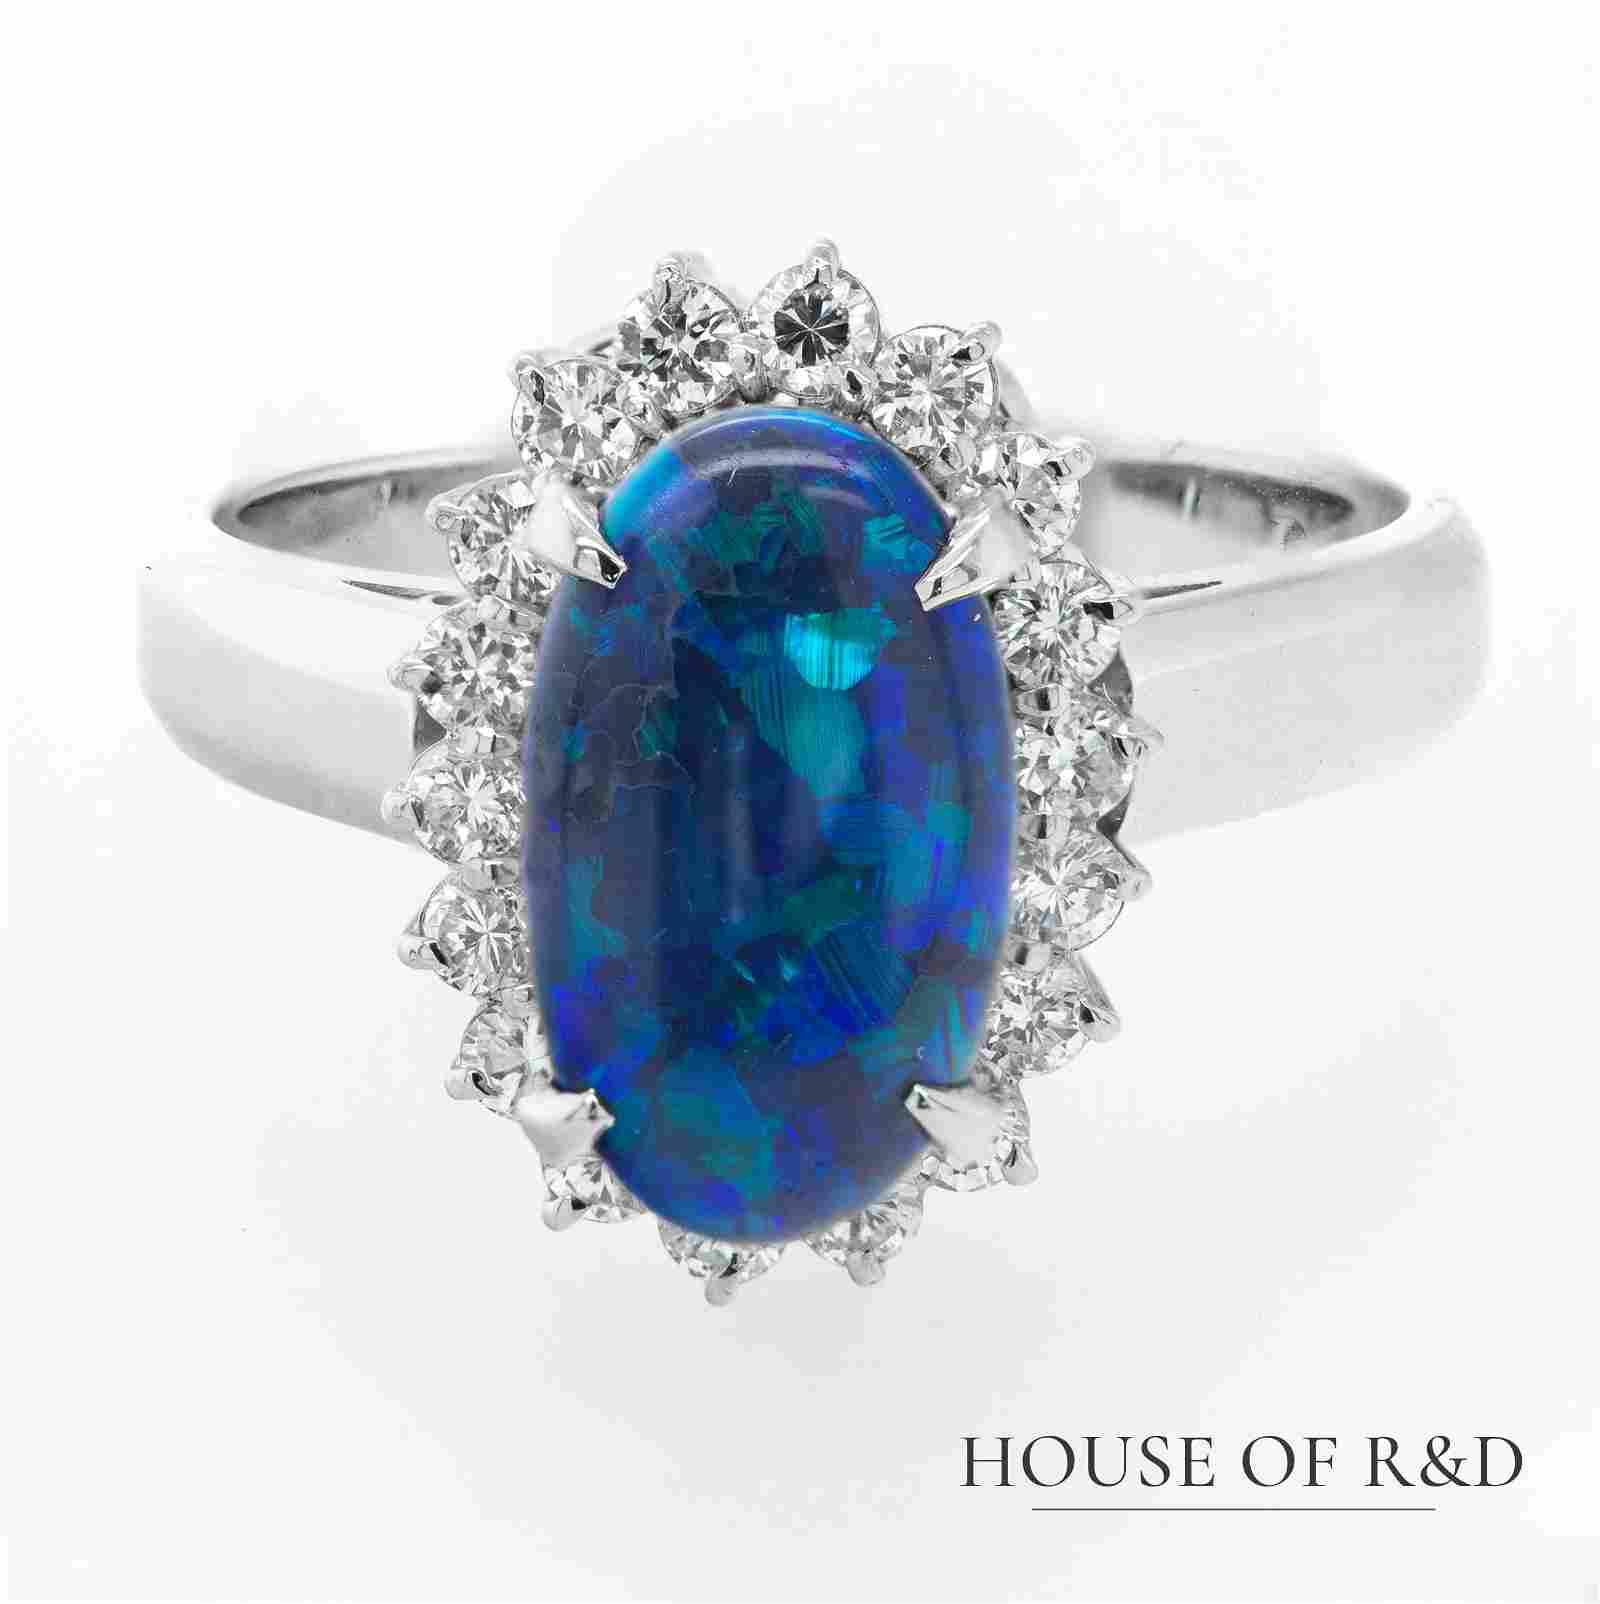 Platinum 900 - 1.84tcw - Opal & Diamonds Ring